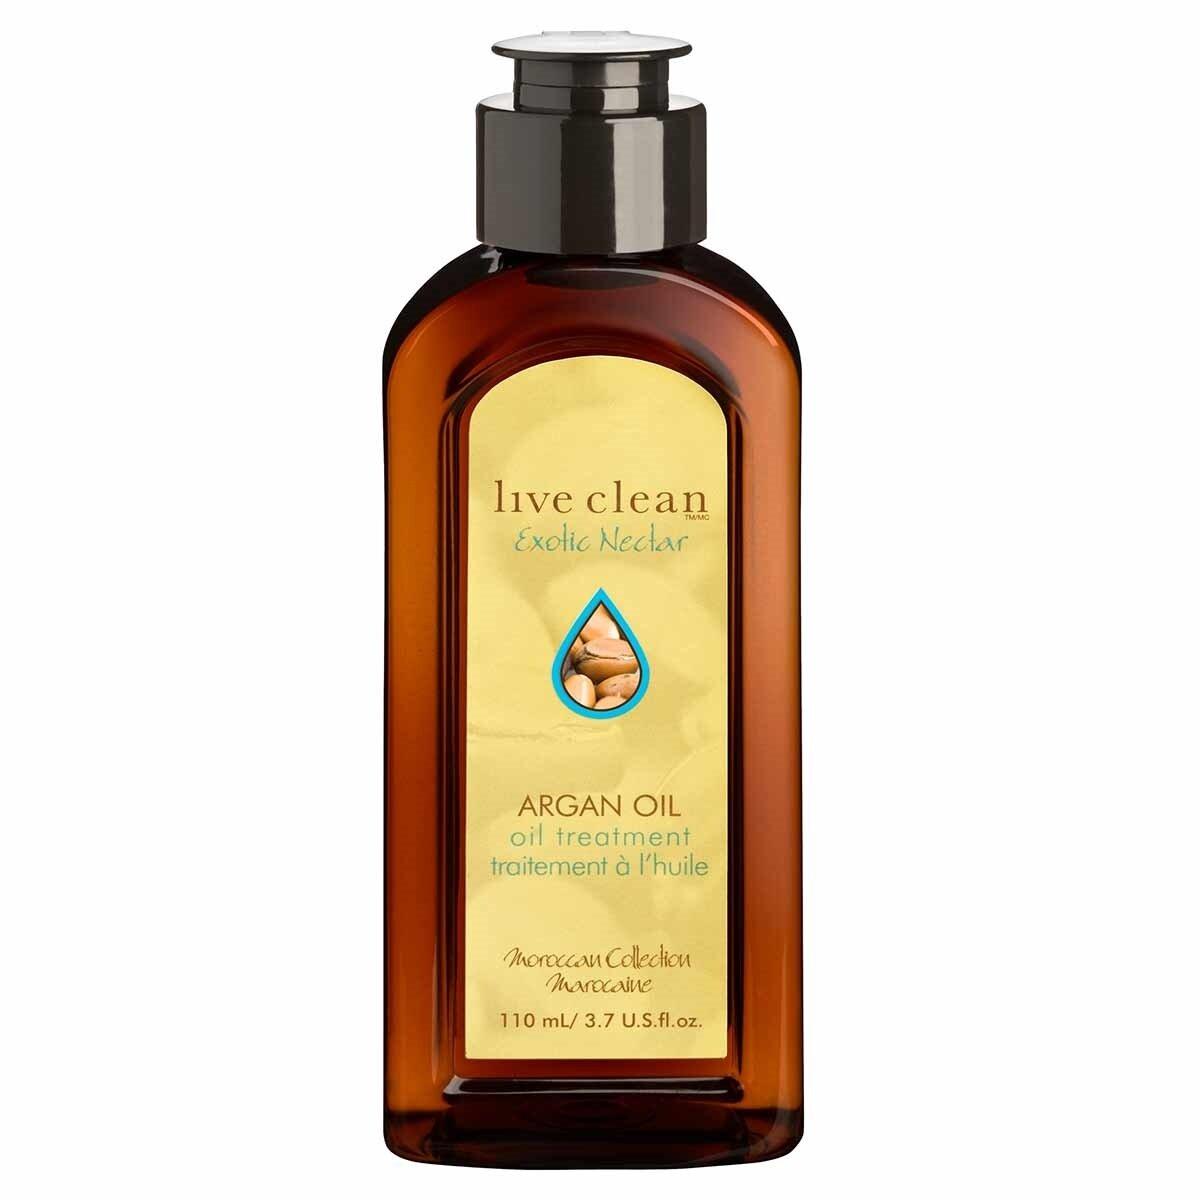 Argan Oil Treatment Saç Bakım Yağı 110 ml